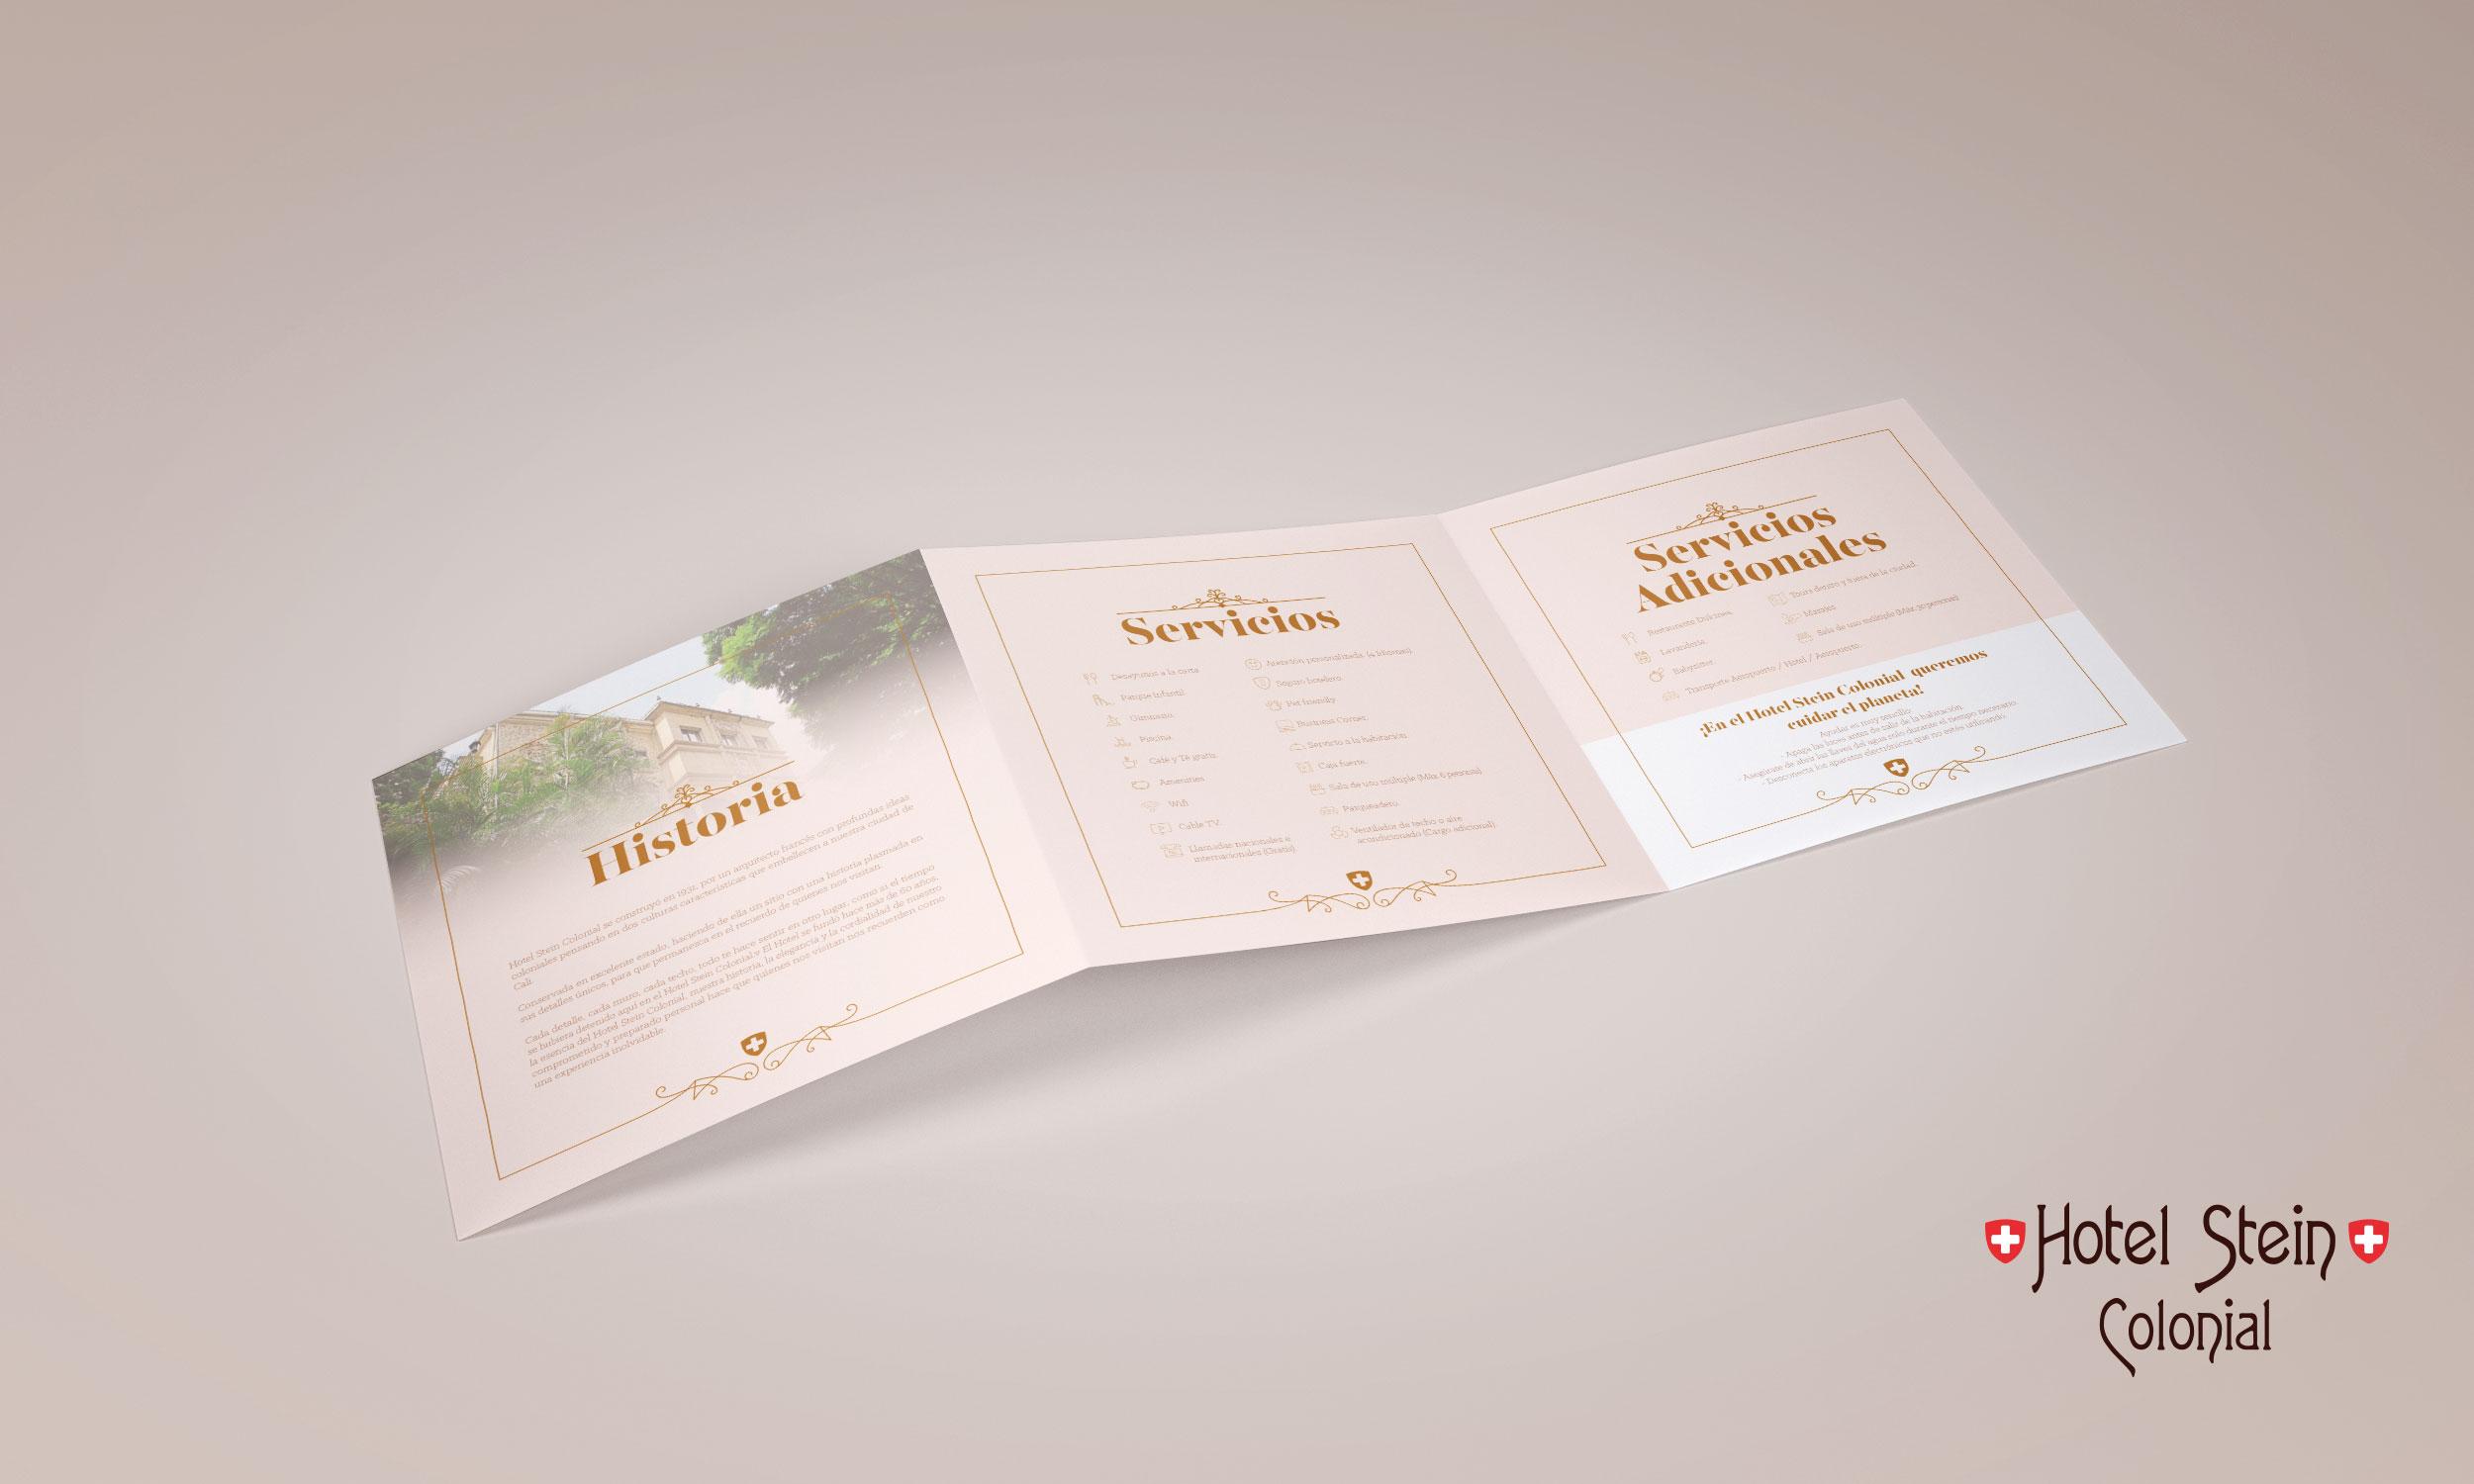 17_04_06_Muestra_Brochure_Hotel_Stein_Colonial_2